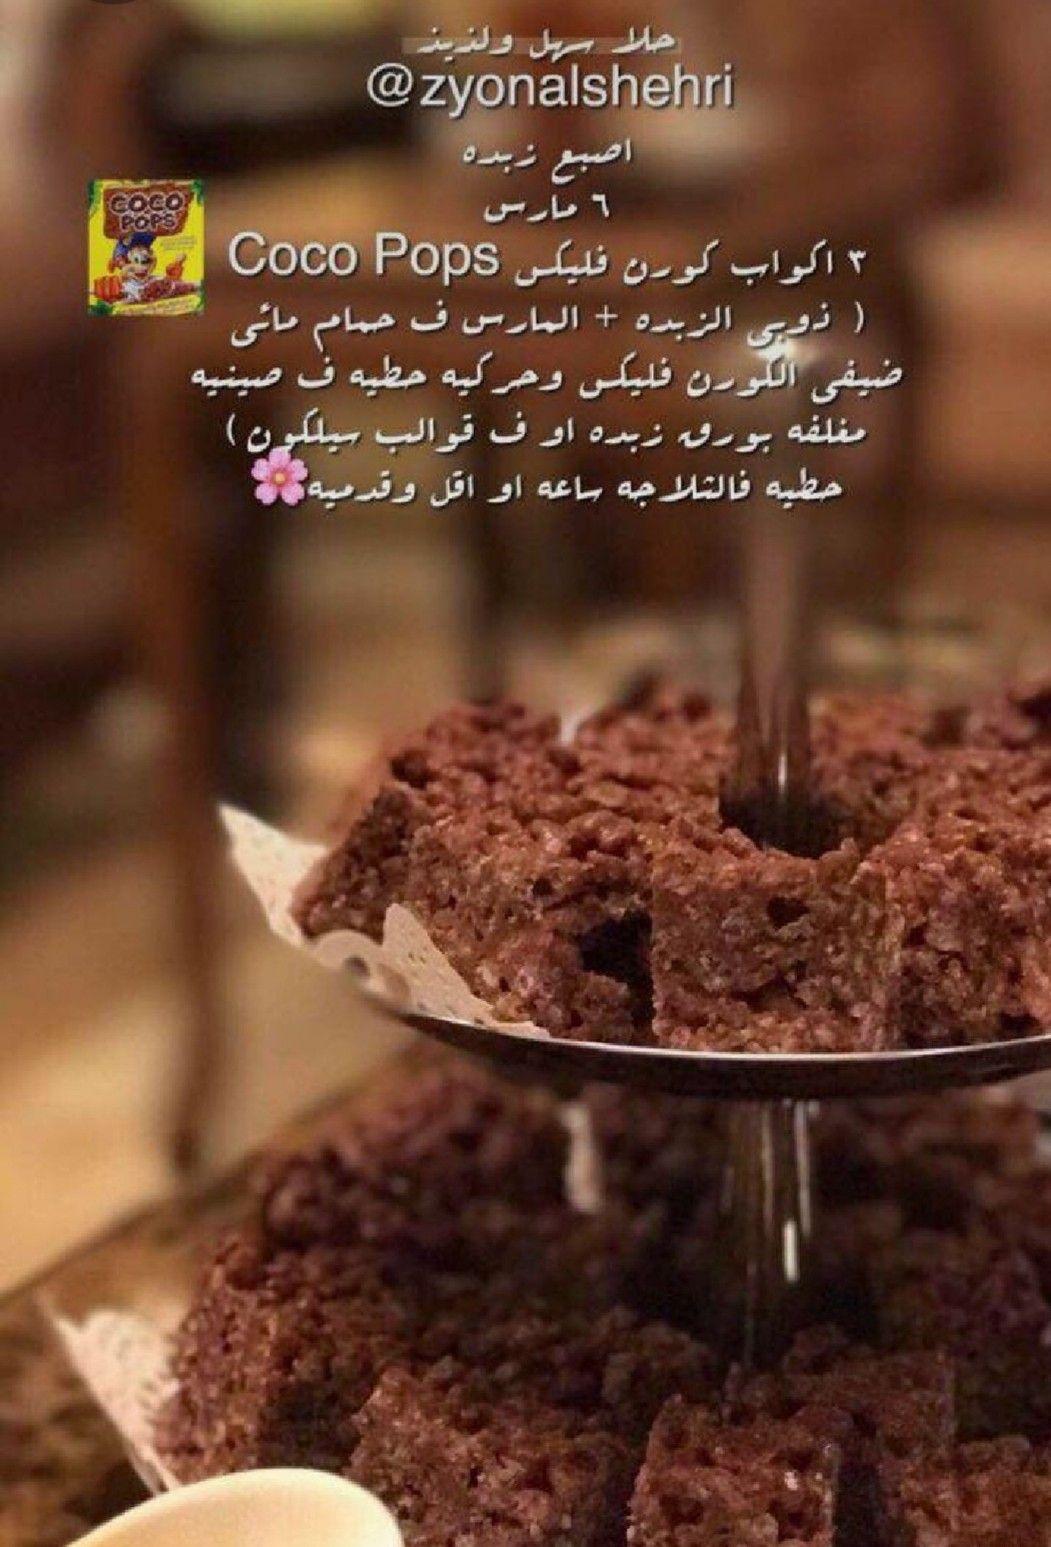 Pin By شوق On منوعات In 2020 Sweet Recipes Arabian Food Food